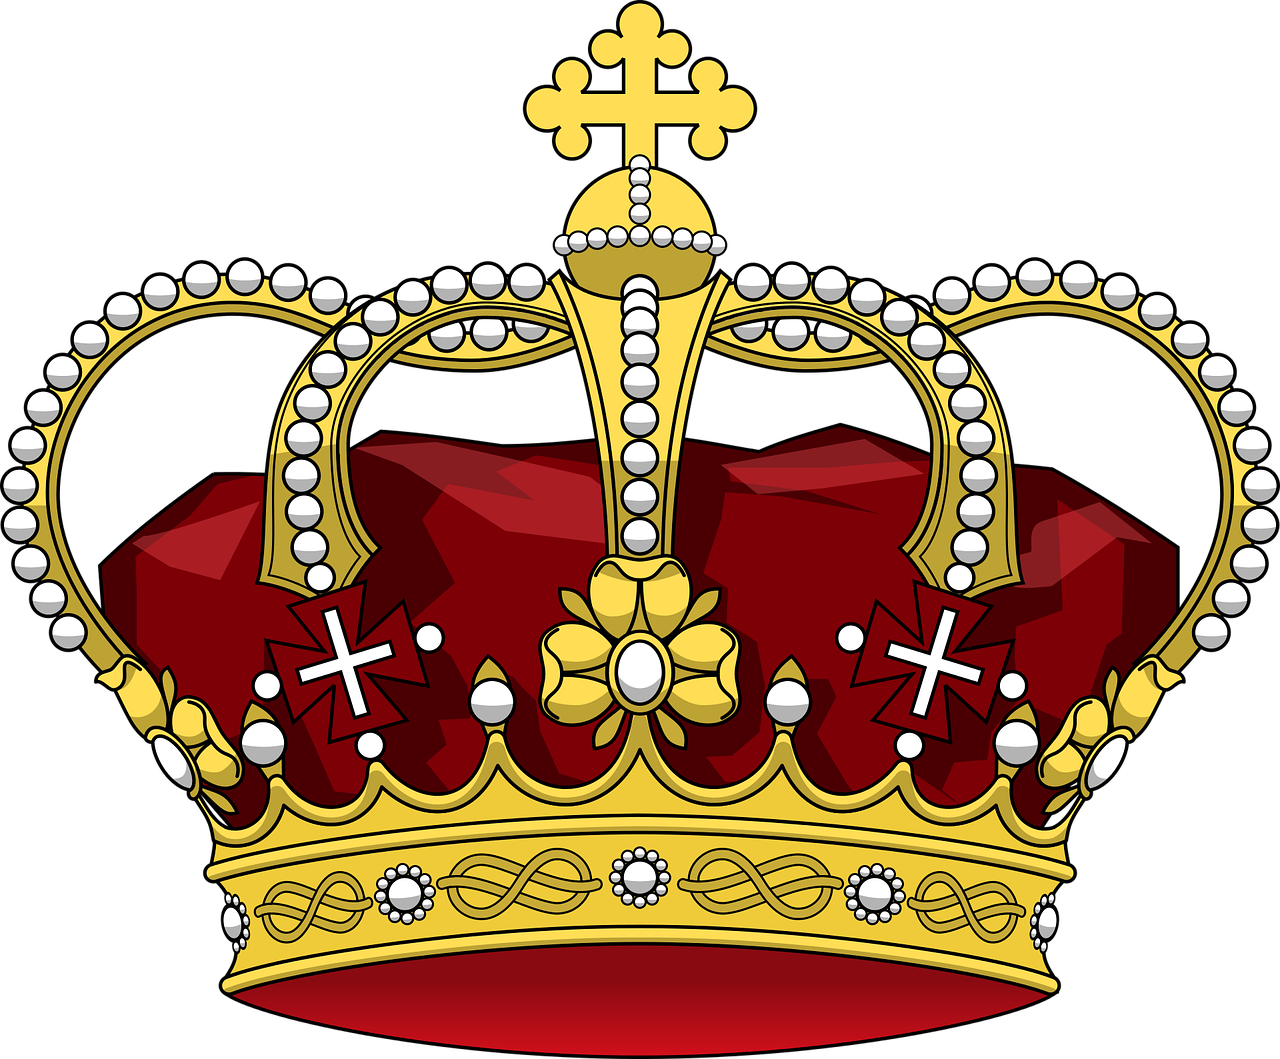 Jewelry crown jewel jewellery. Crowns clipart female royal